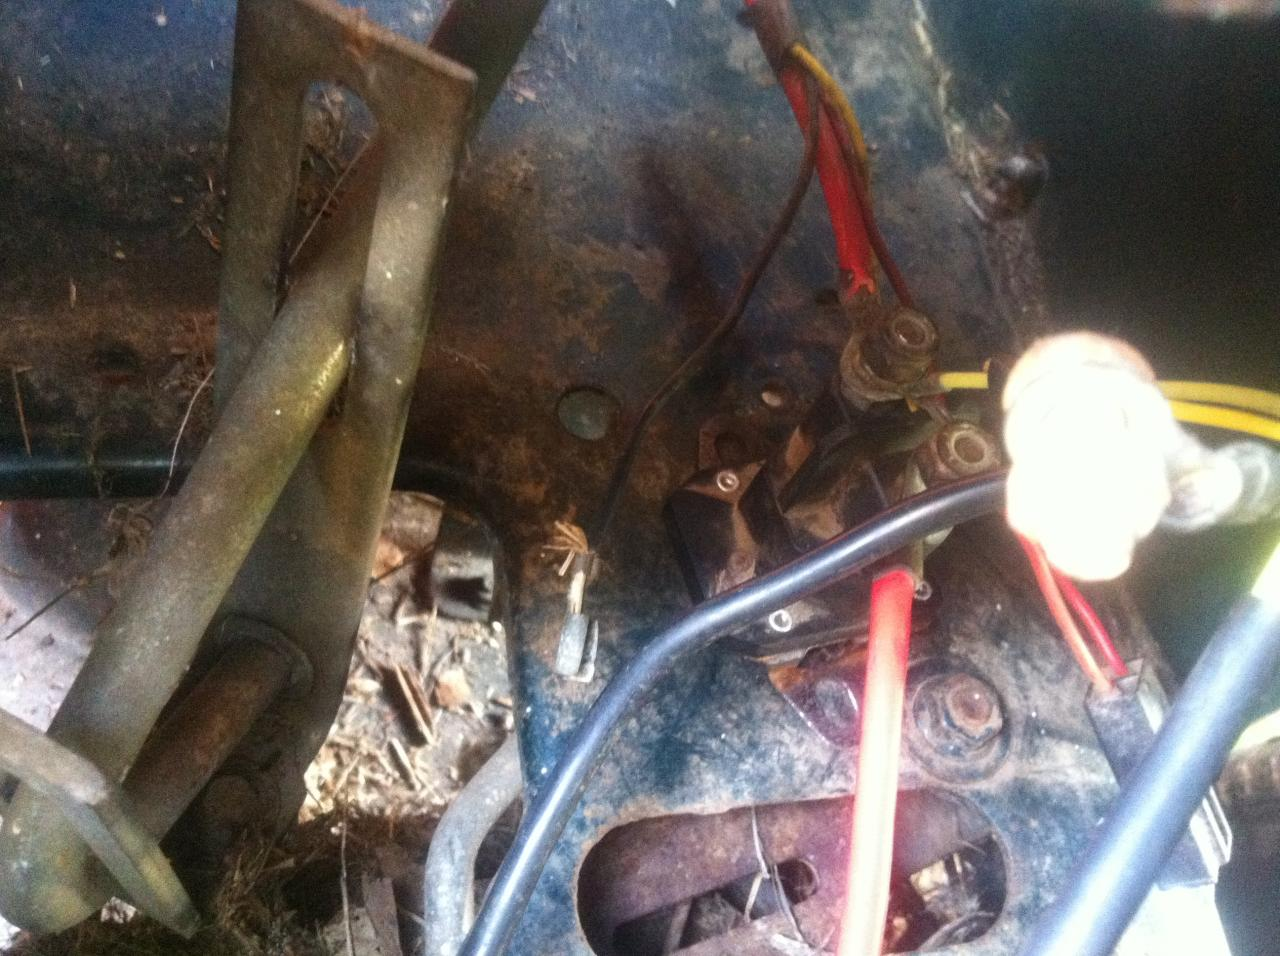 Victa 3012tx Solenoid Wiring Outdoorking Repair Forum Engine Mount Diagram And Parts List For Murray Walkbehindlawnmower Linked Image